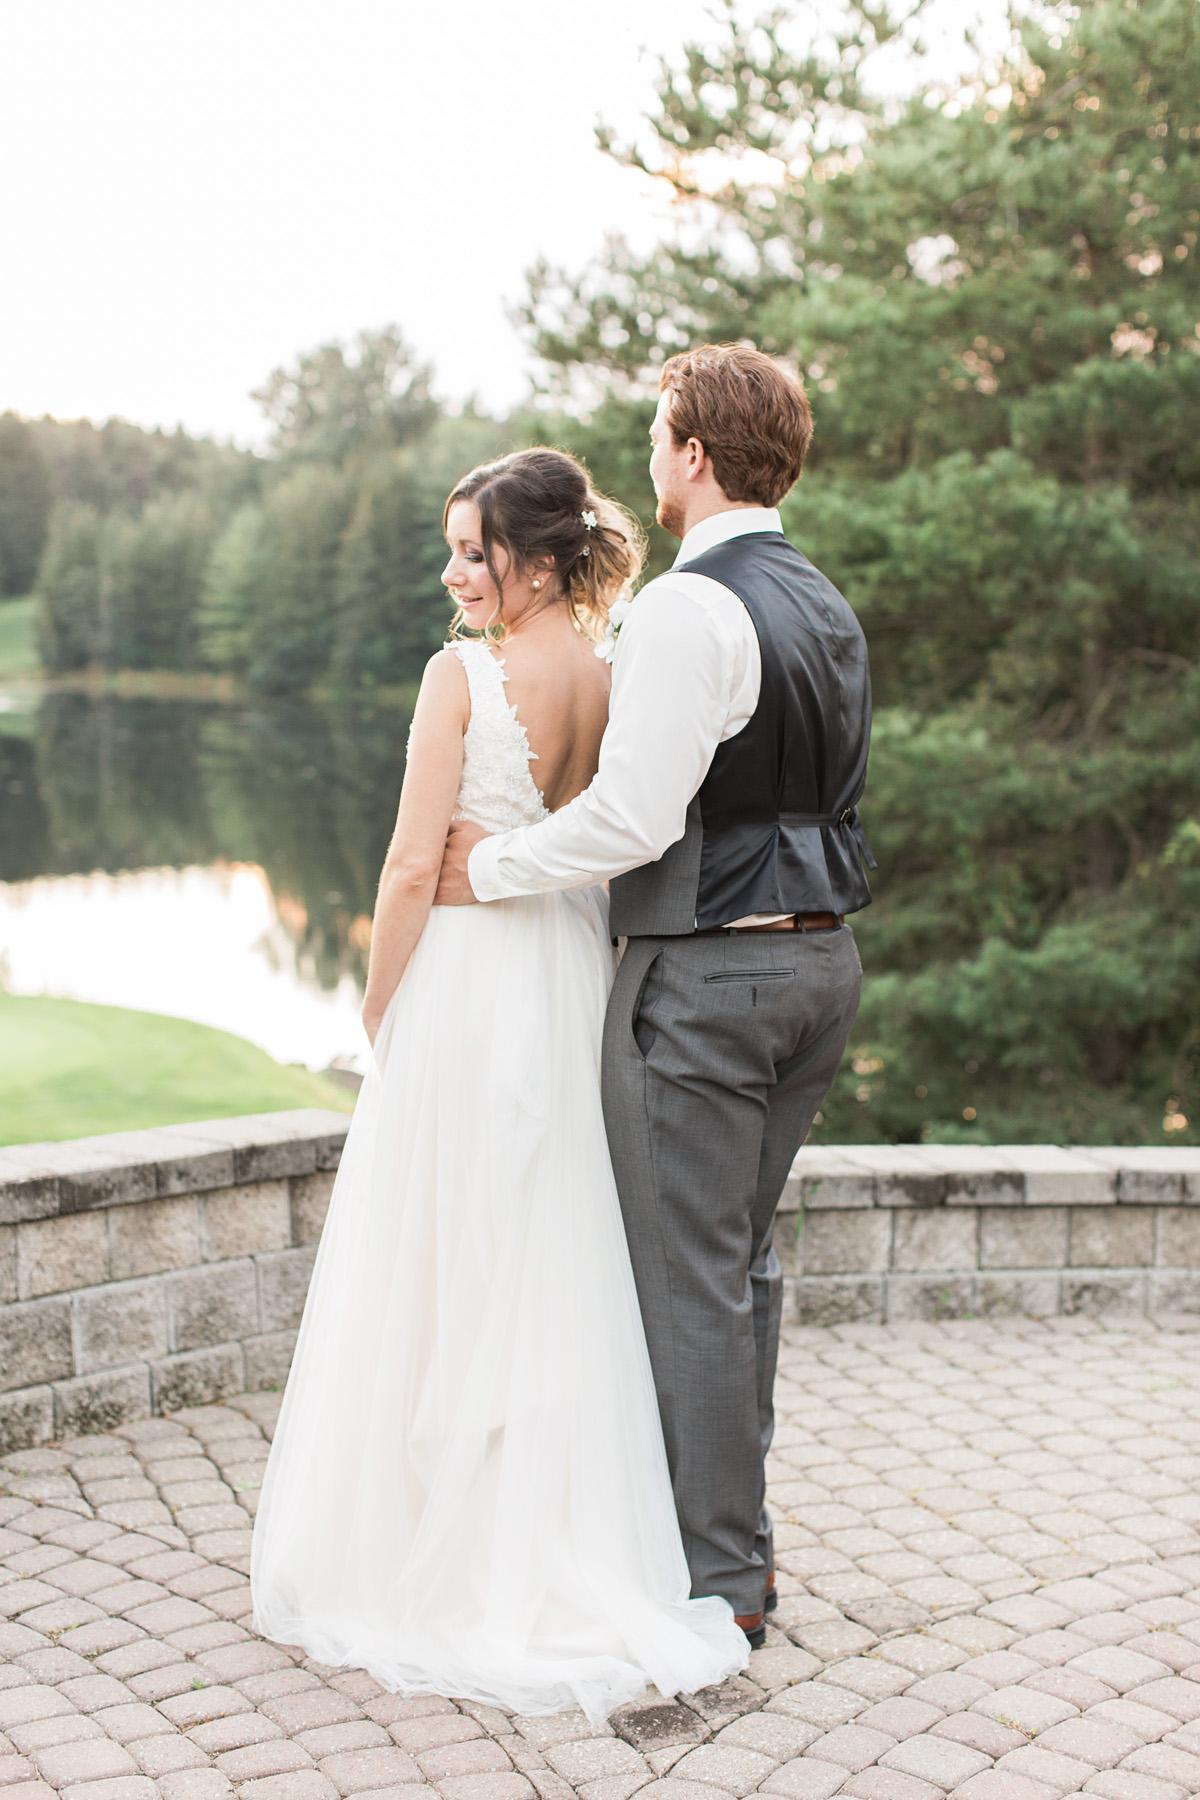 wedding photographs shot on film